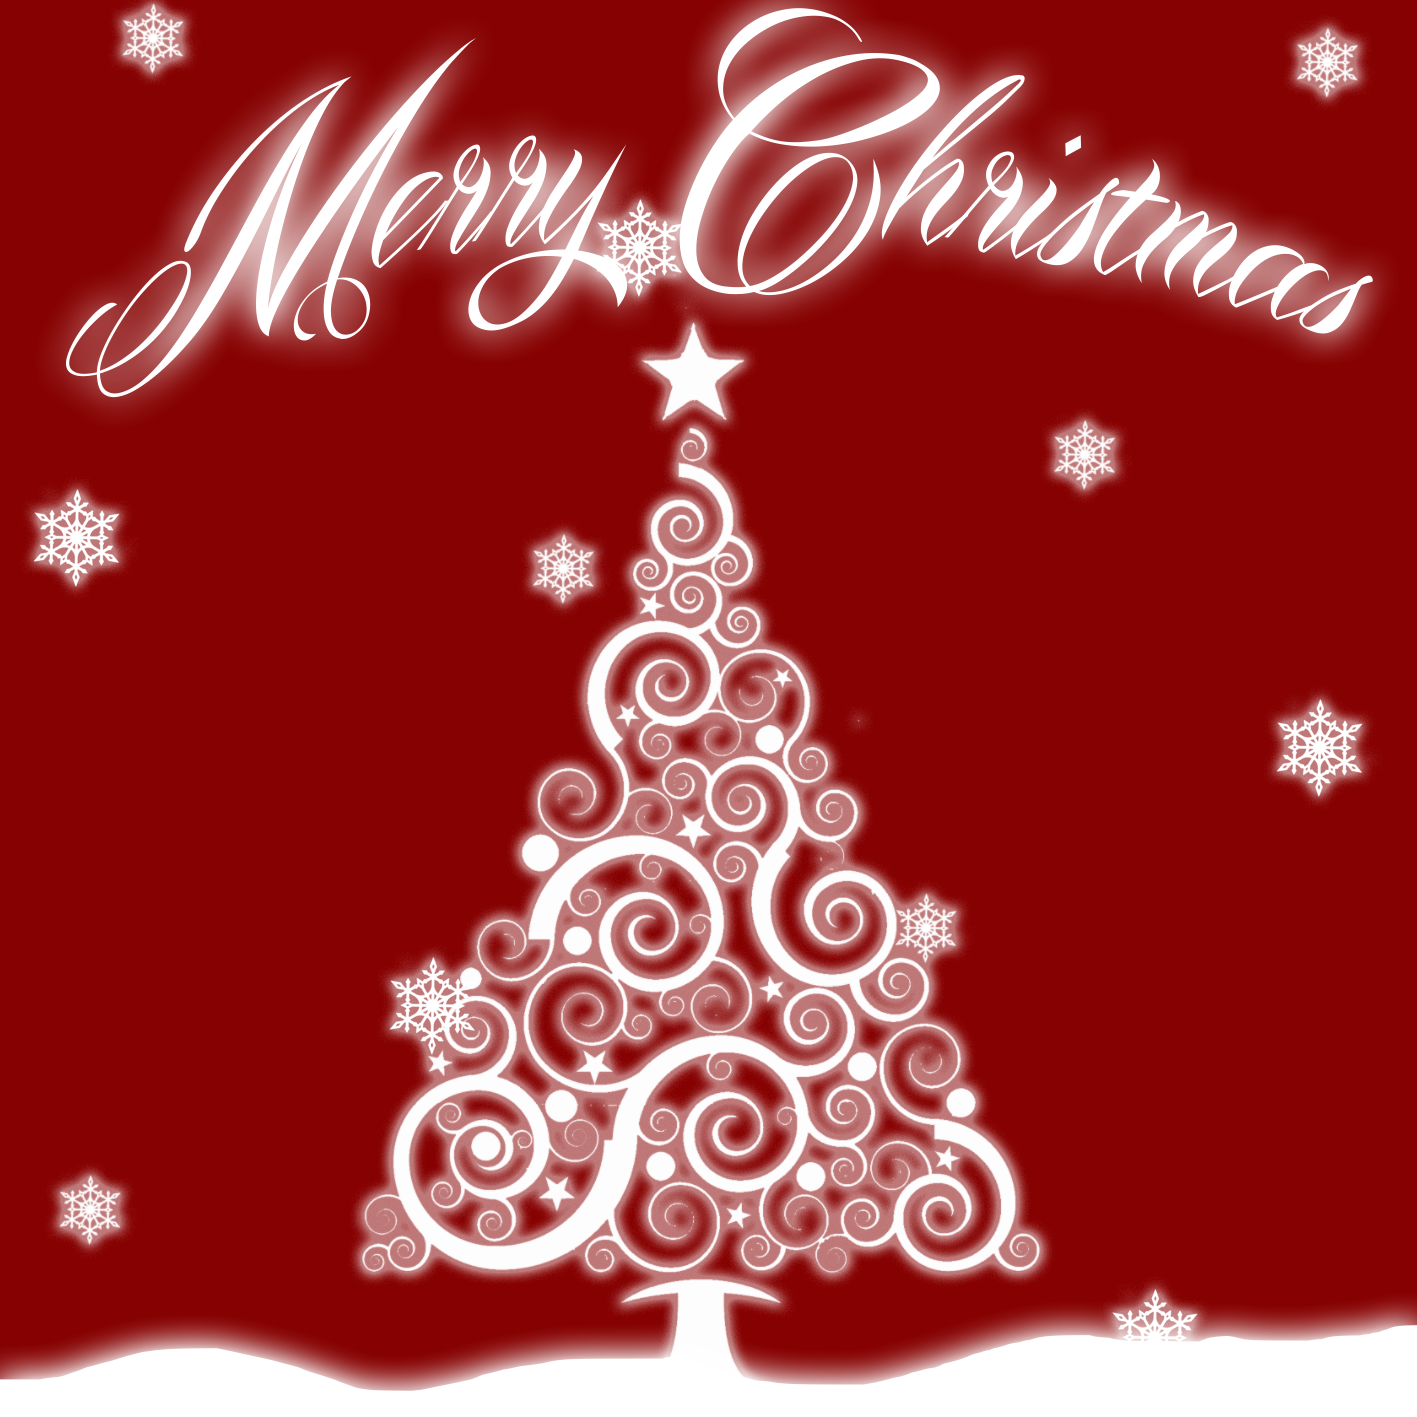 Christmas card, graphic design. Lillestrøm High School